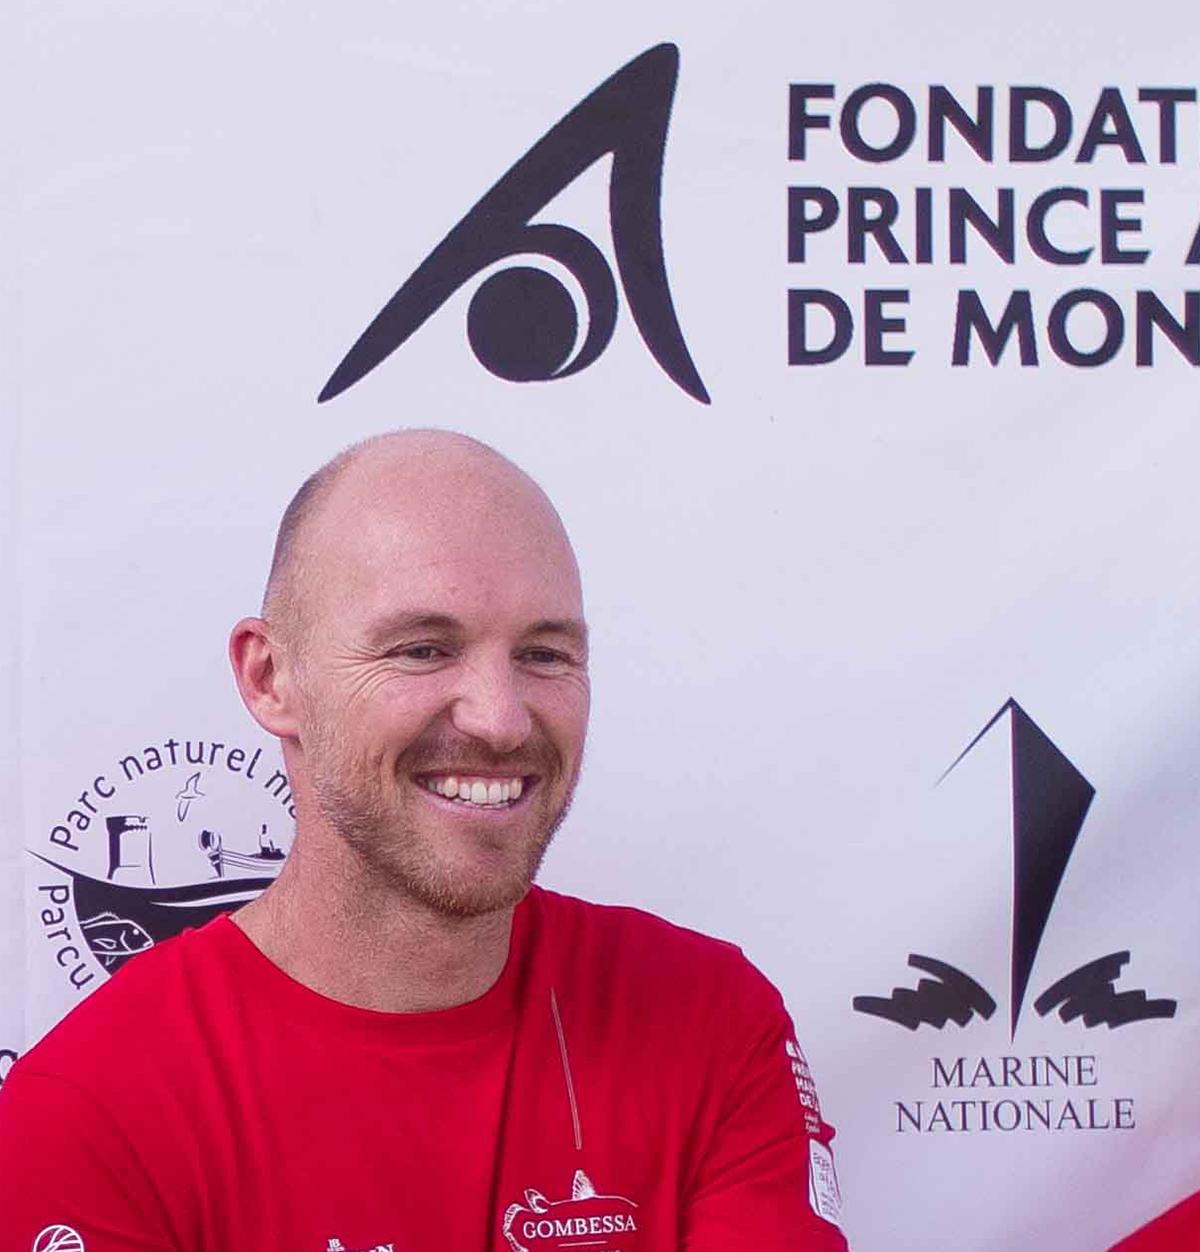 Antonin Guilbert, aquanaut of the Gombessa 6 expedition. Monaco, 20 July 2021.